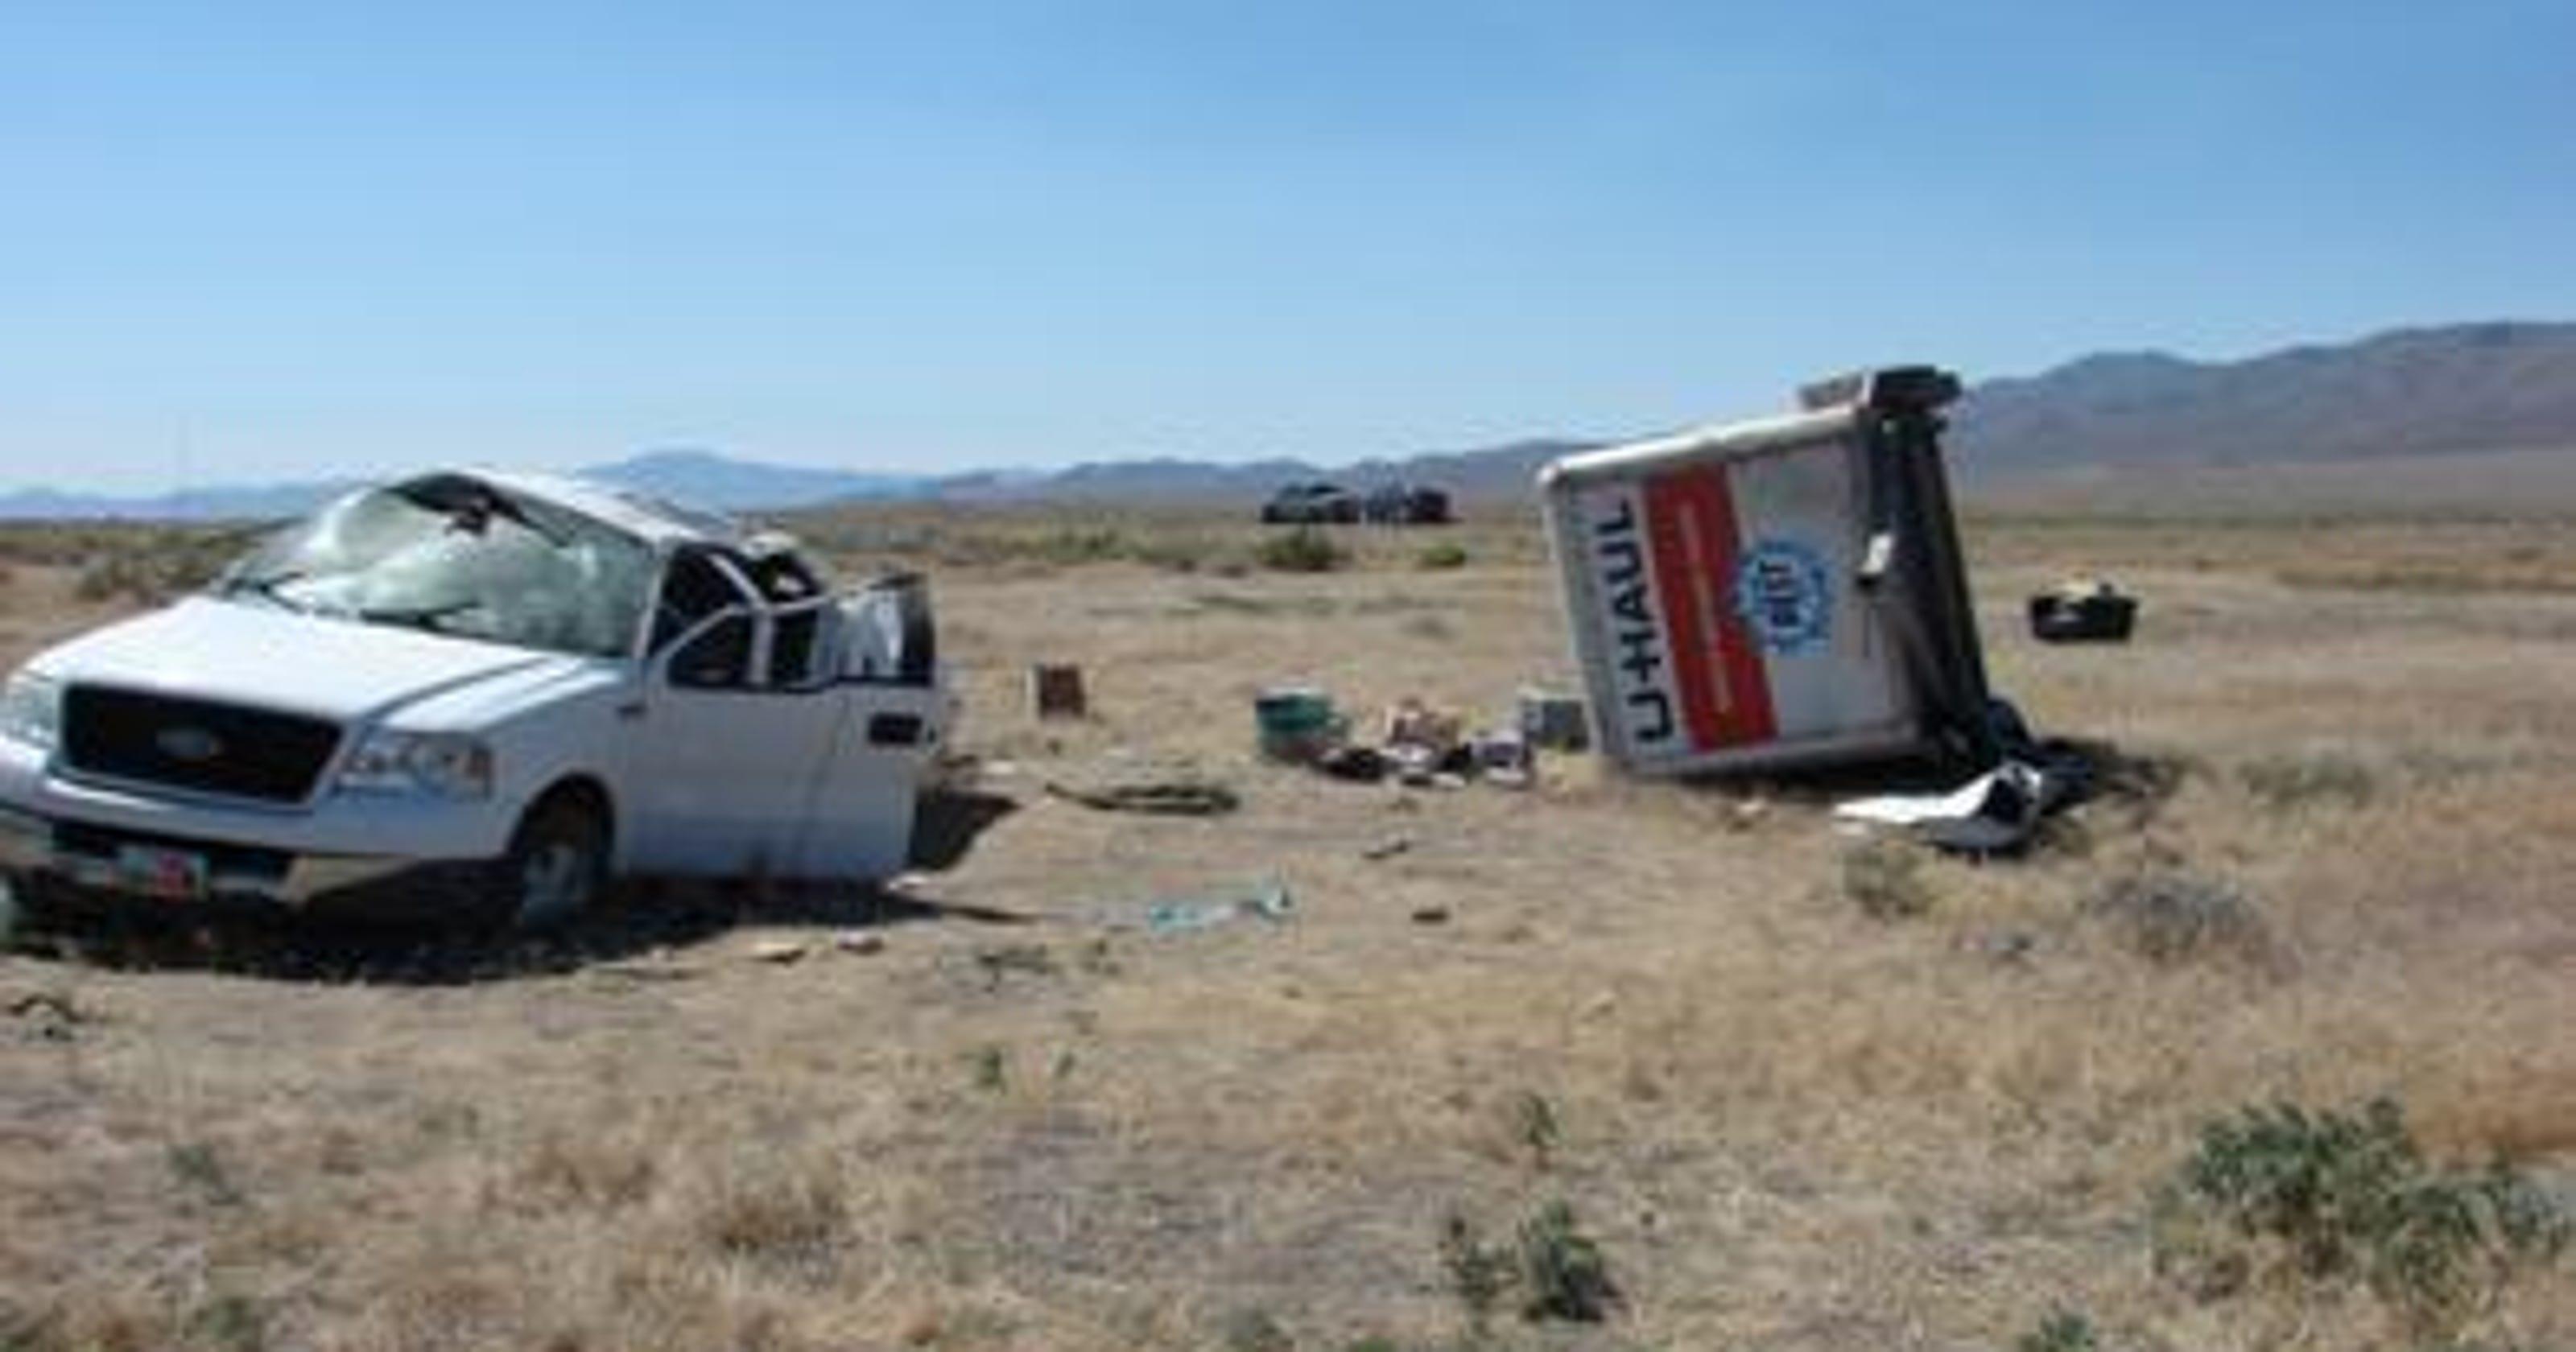 Battle Mountain crash kills mother, daughter, injures 3